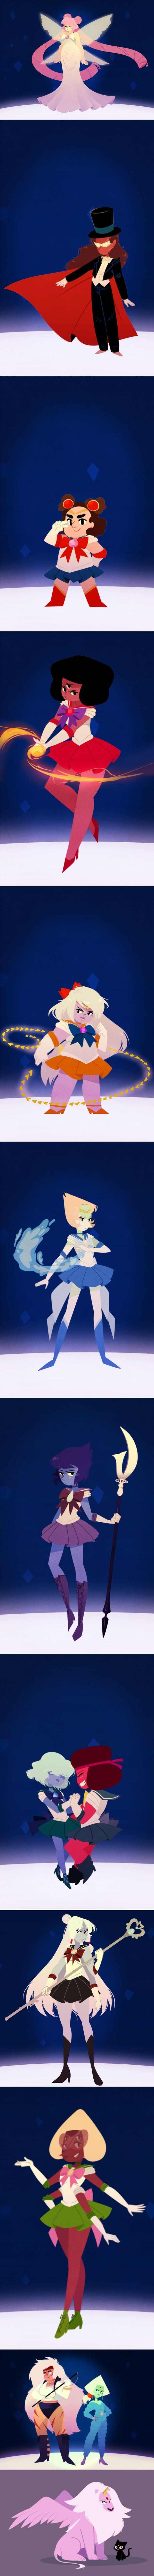 Steven Universe - Sailor Moon parody